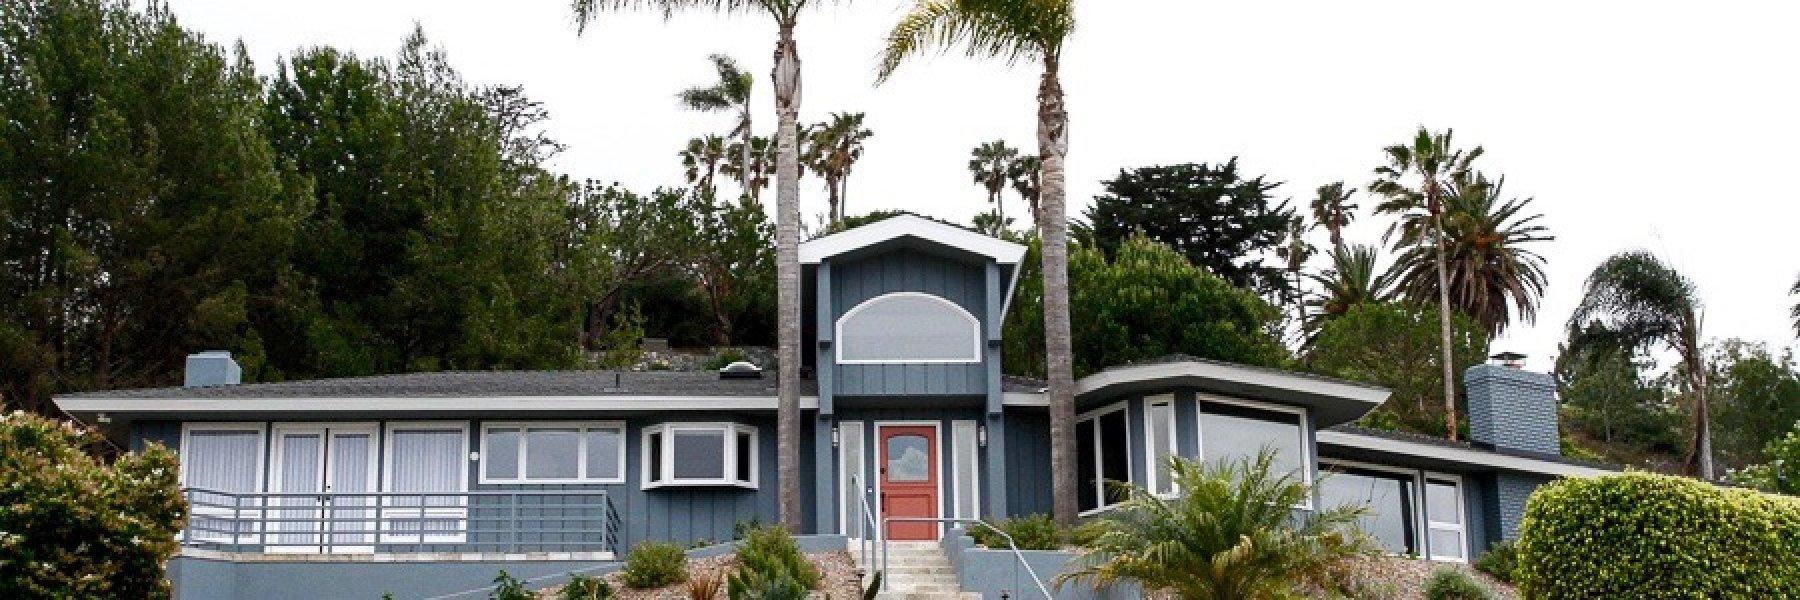 Muirlands is a community of homes in La Jolla California